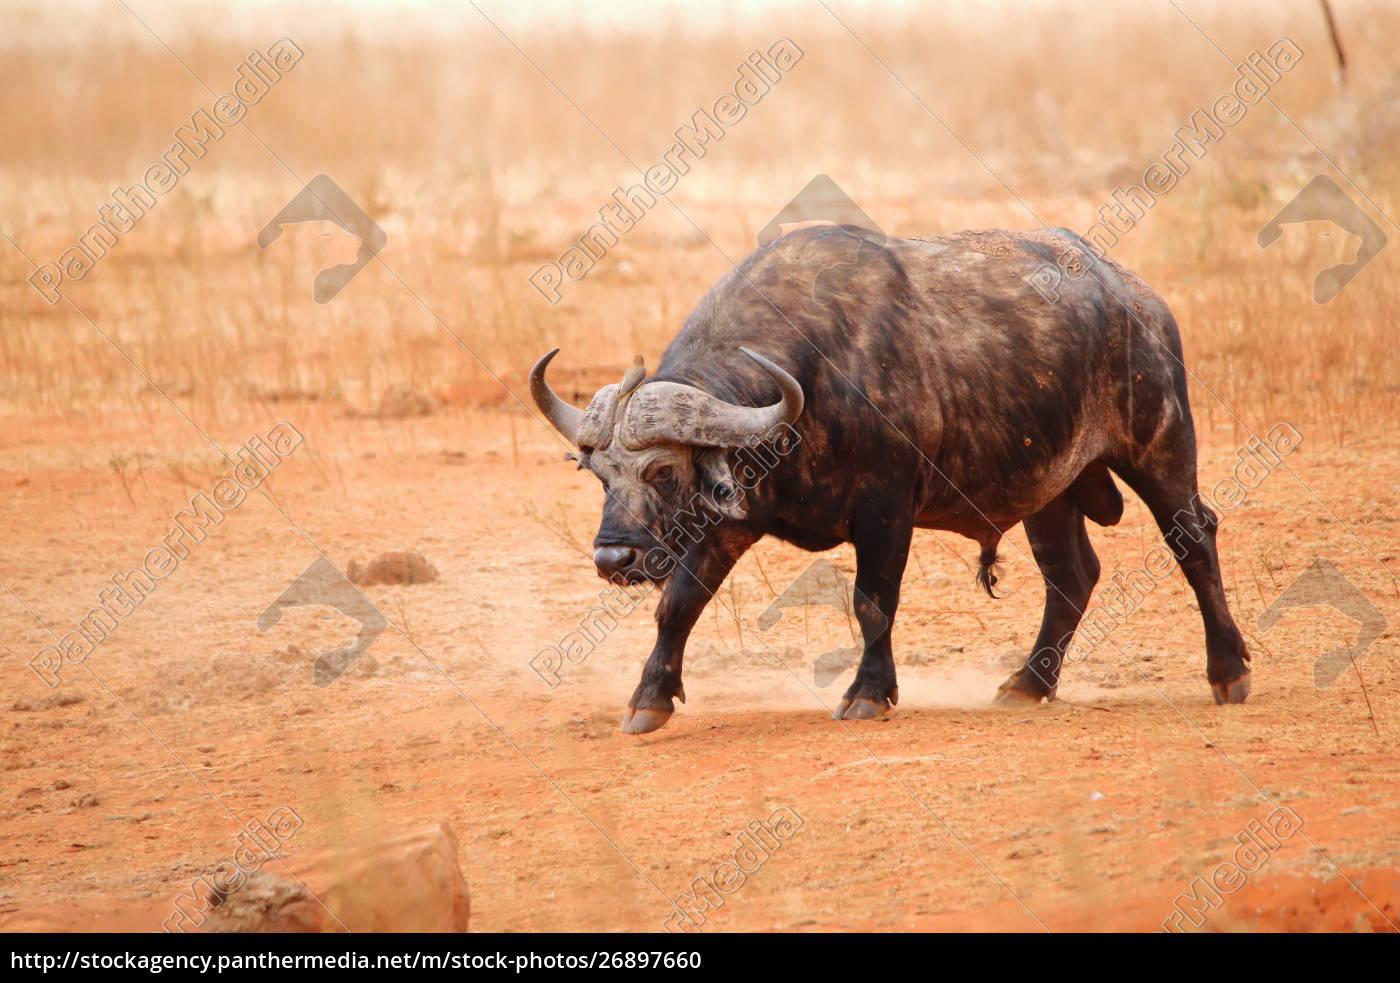 kapbüffel, im, ngutuni, wildreservat - 26897660